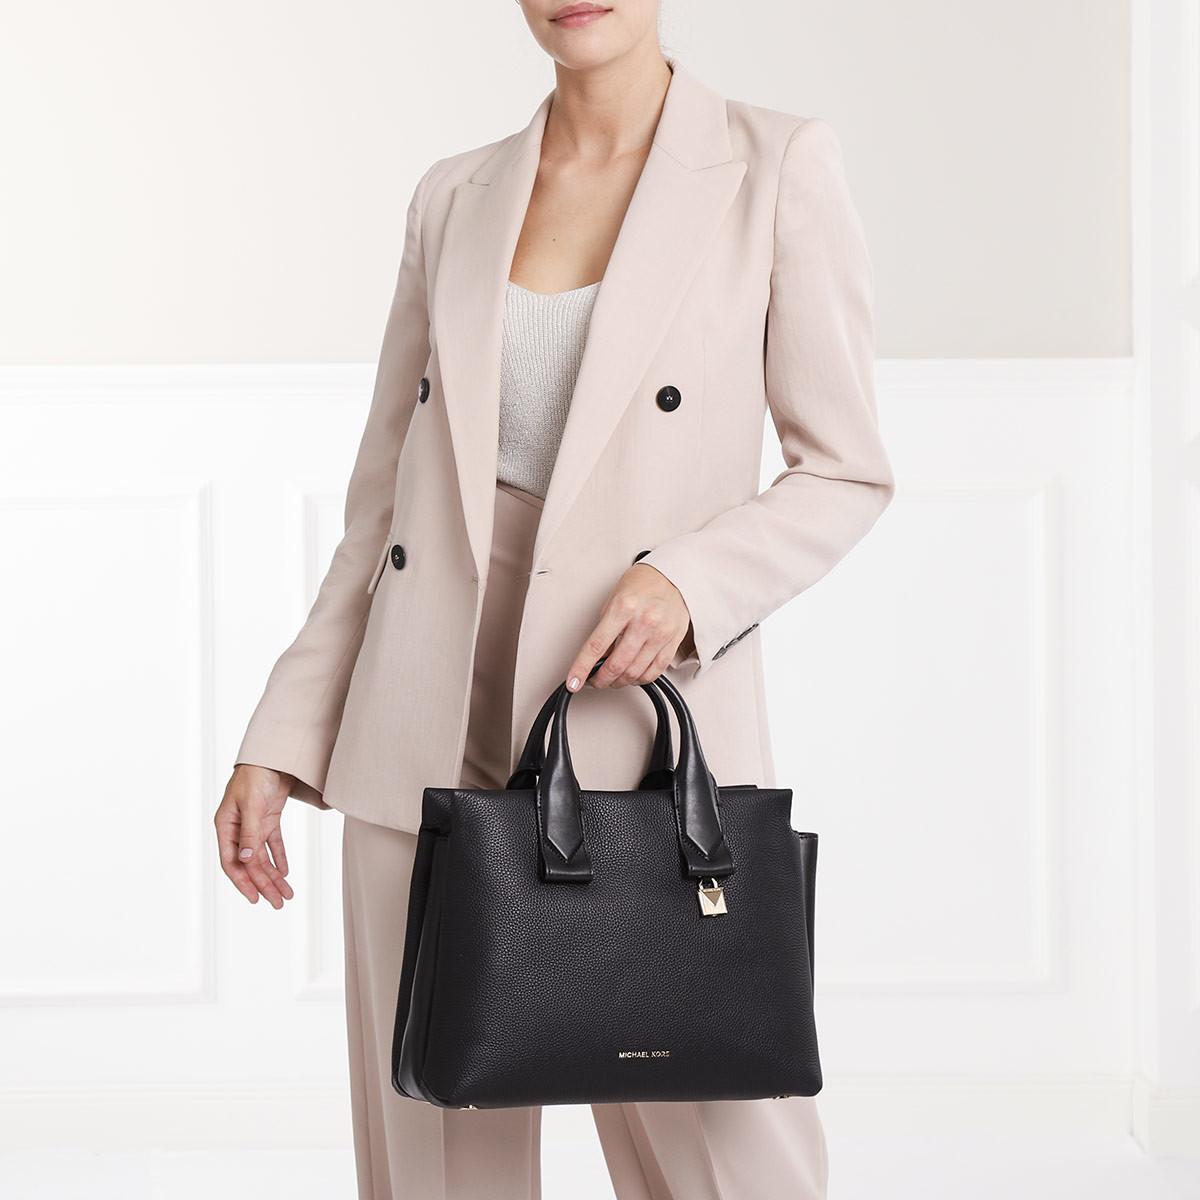 23a6662c75ff1 Michael Kors Satchel Bag - Benning LG Satchel Bag Pearl Grey - in ...